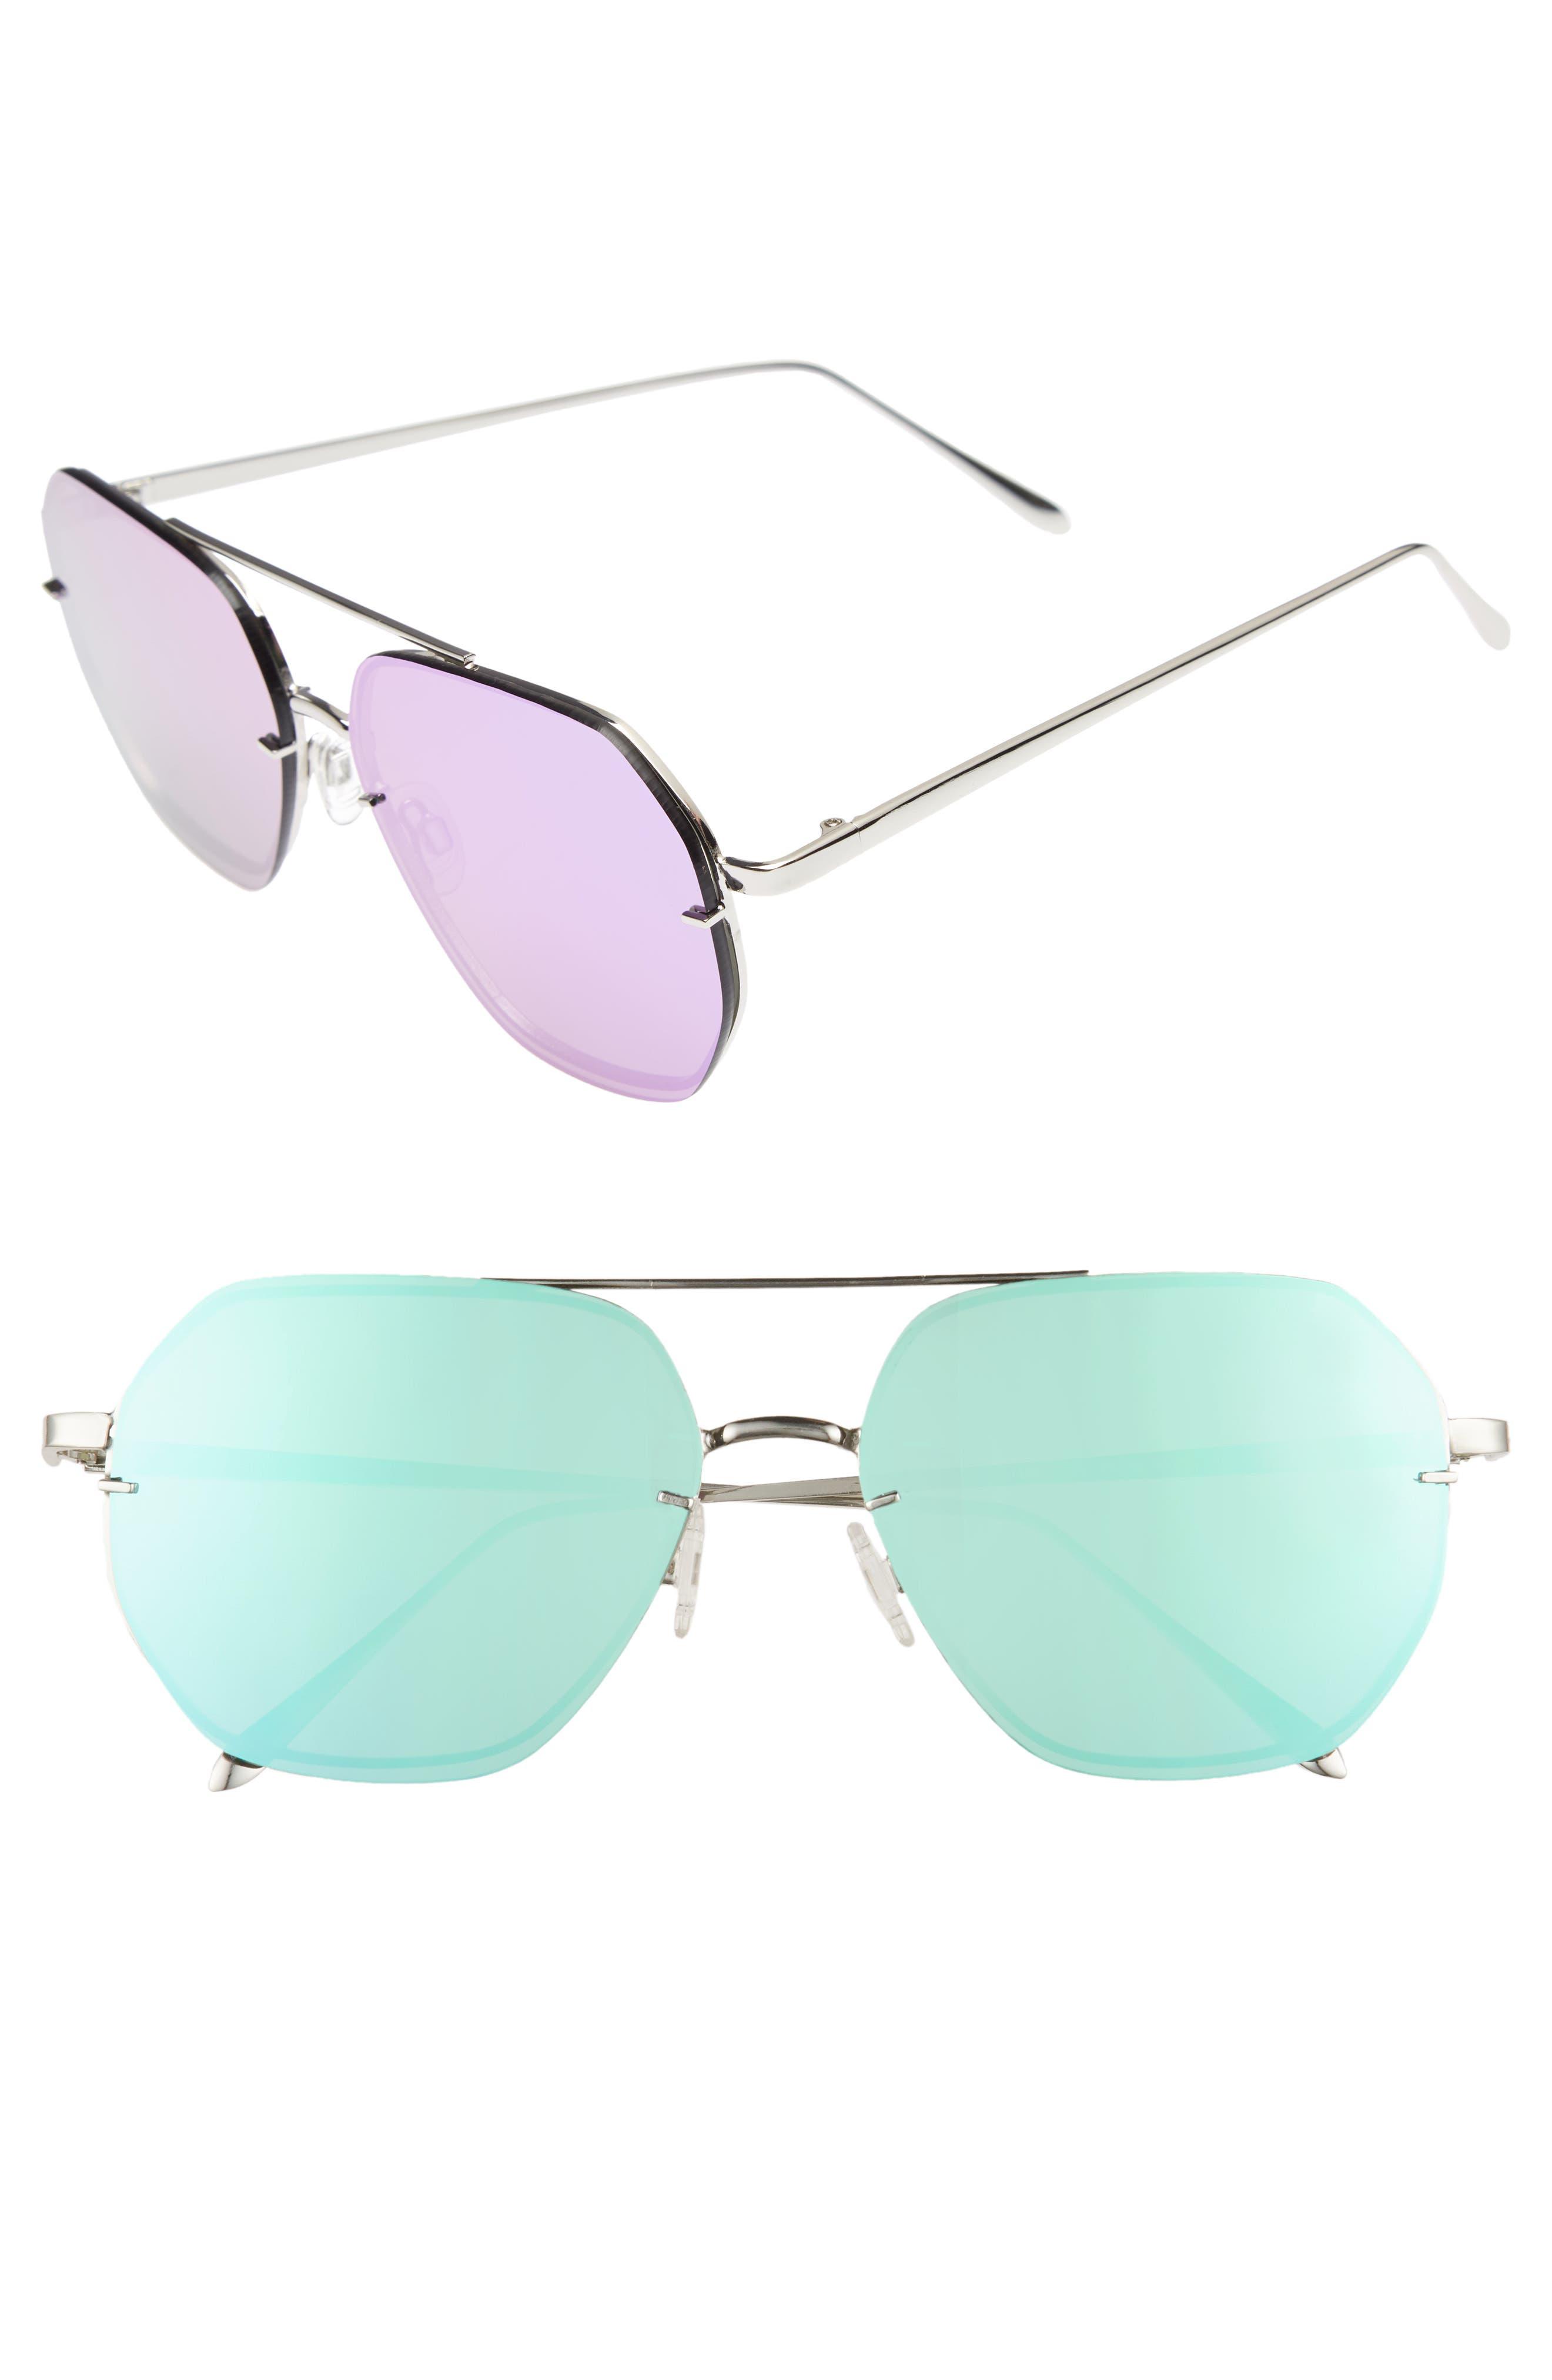 62mm Metal Flat Geo Aviator Sunglasses,                         Main,                         color, SILVER/ PURPLE